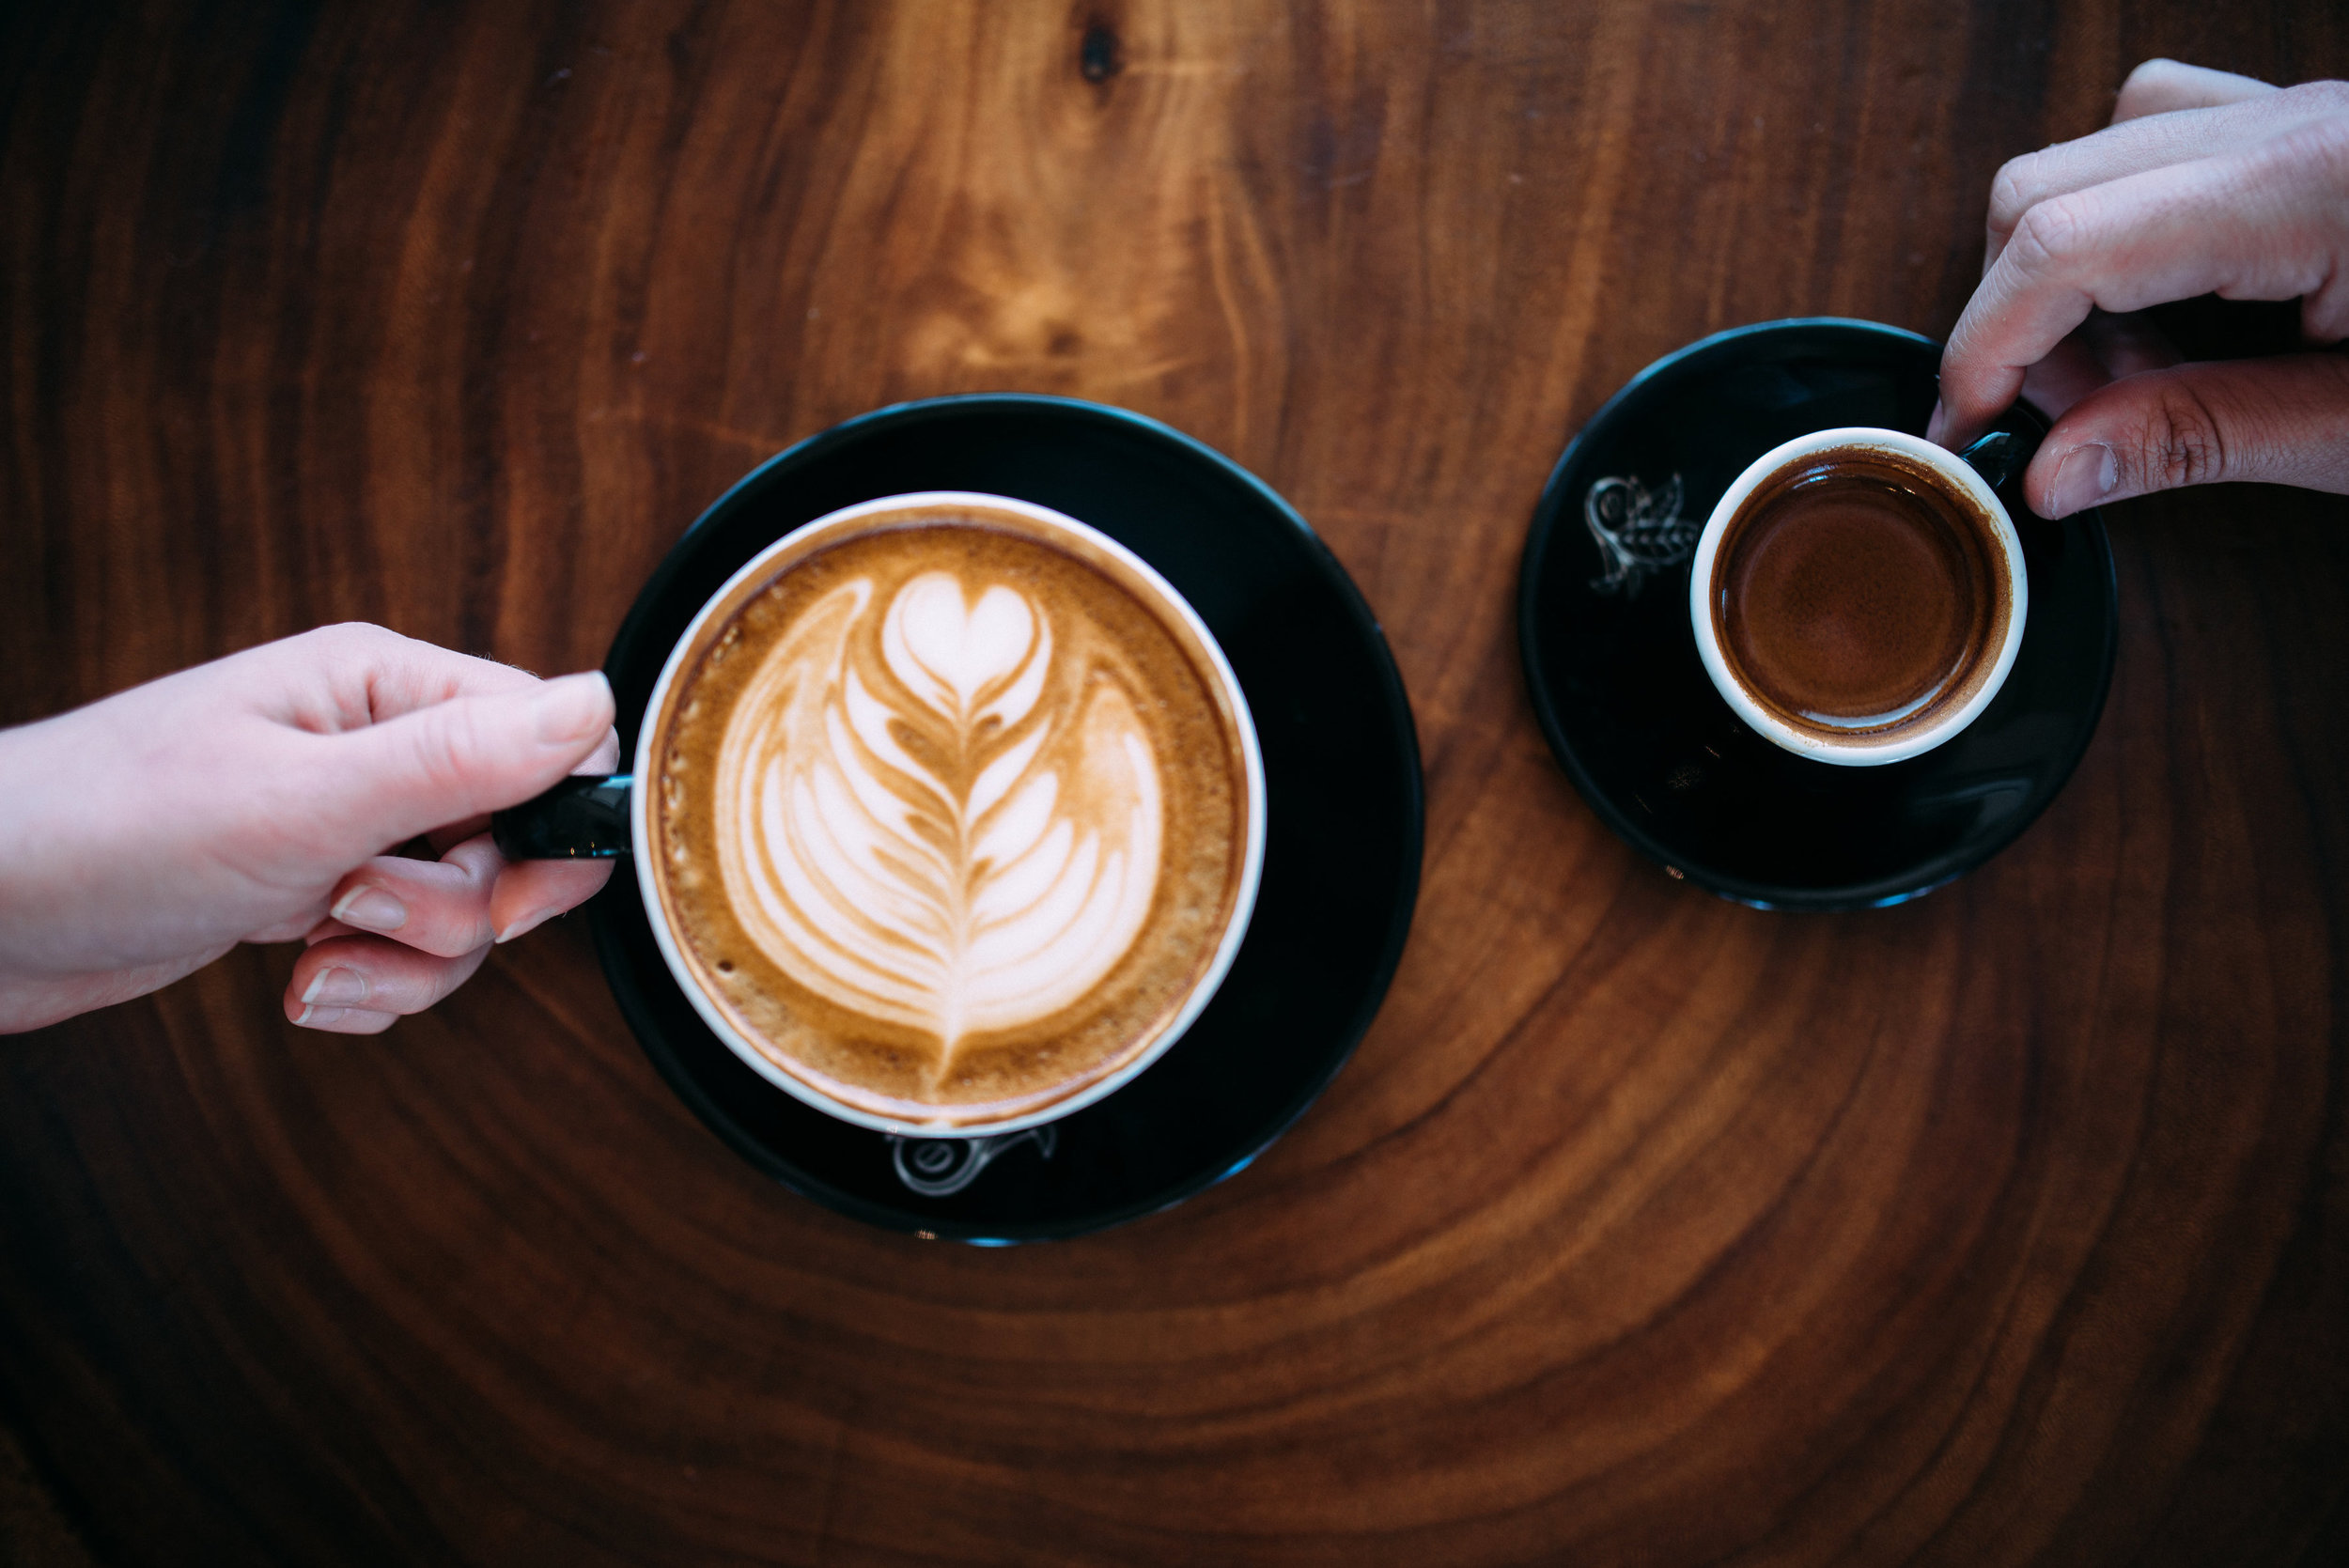 A Latte (coffee and milk) vs. an espresso shot have different amounts of caffeine. PHOTO: Blake Wisz